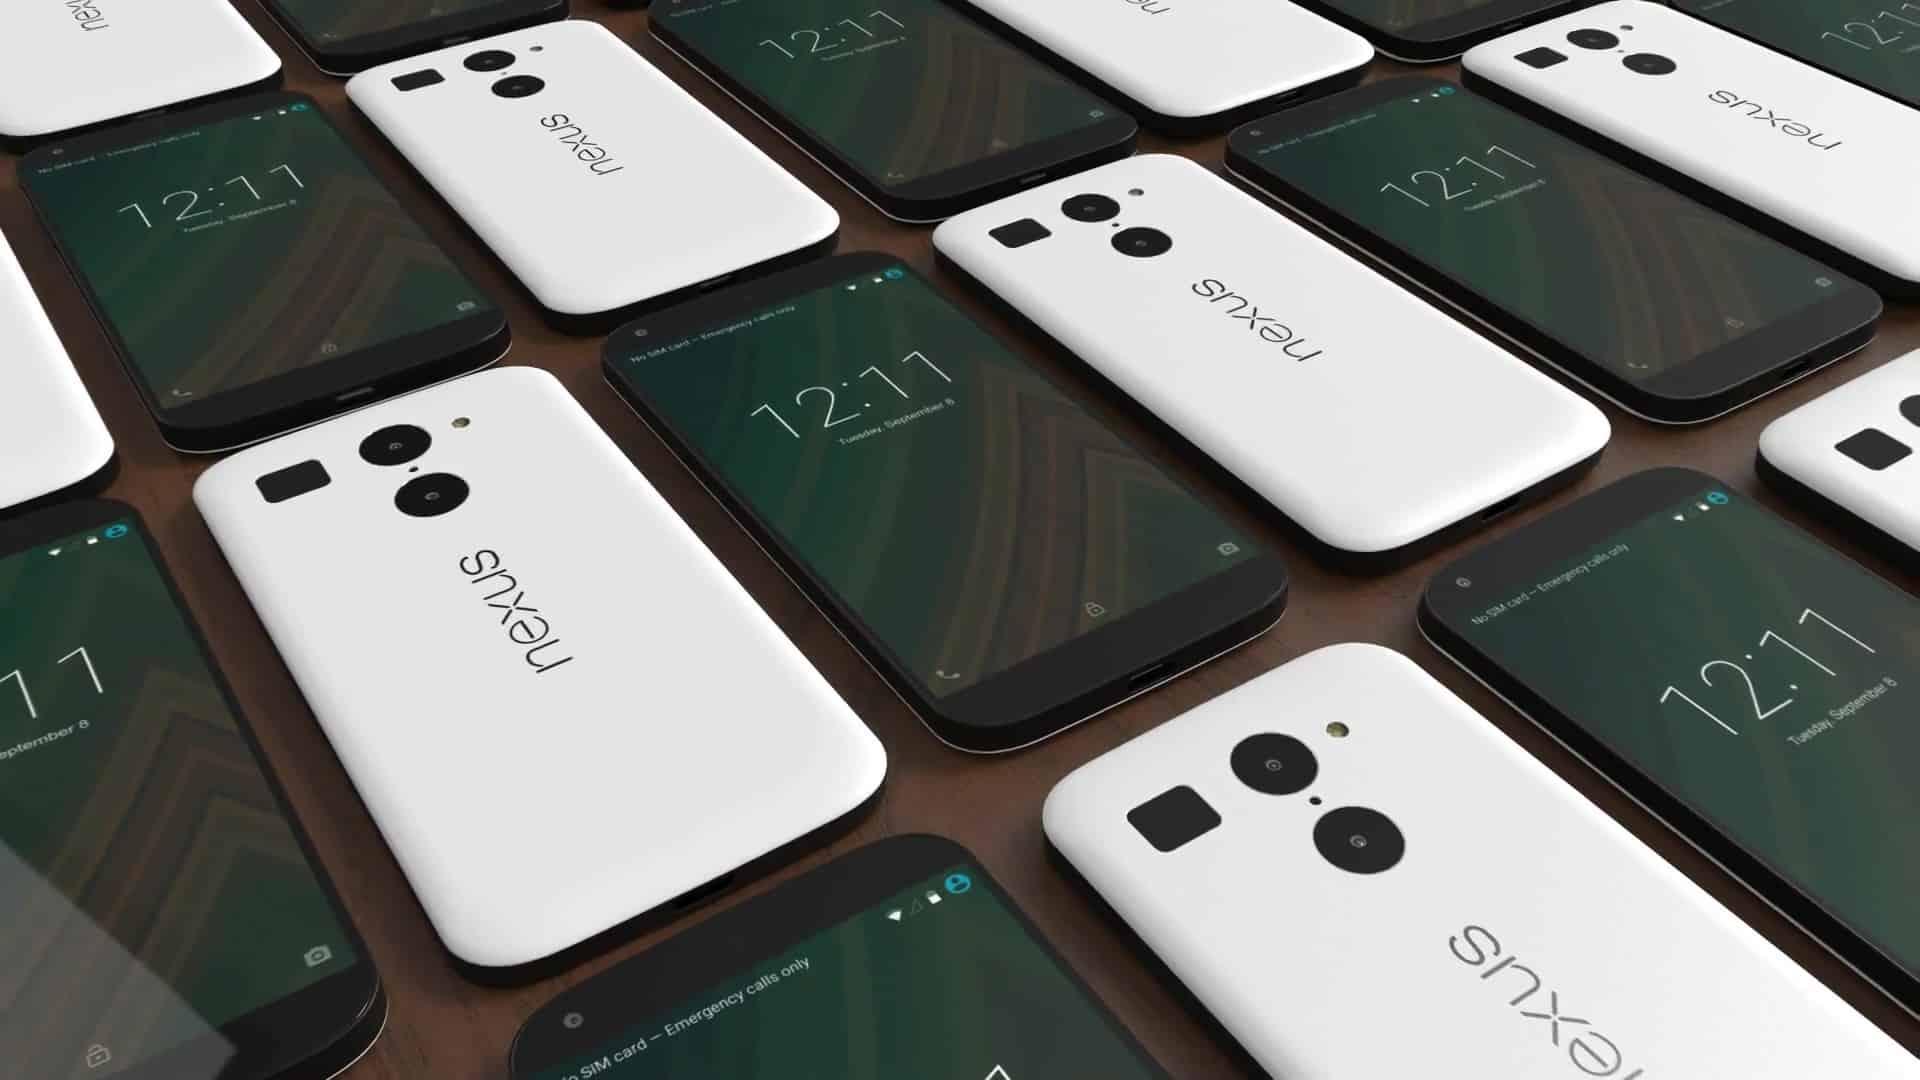 LG Nexus Concept 2015